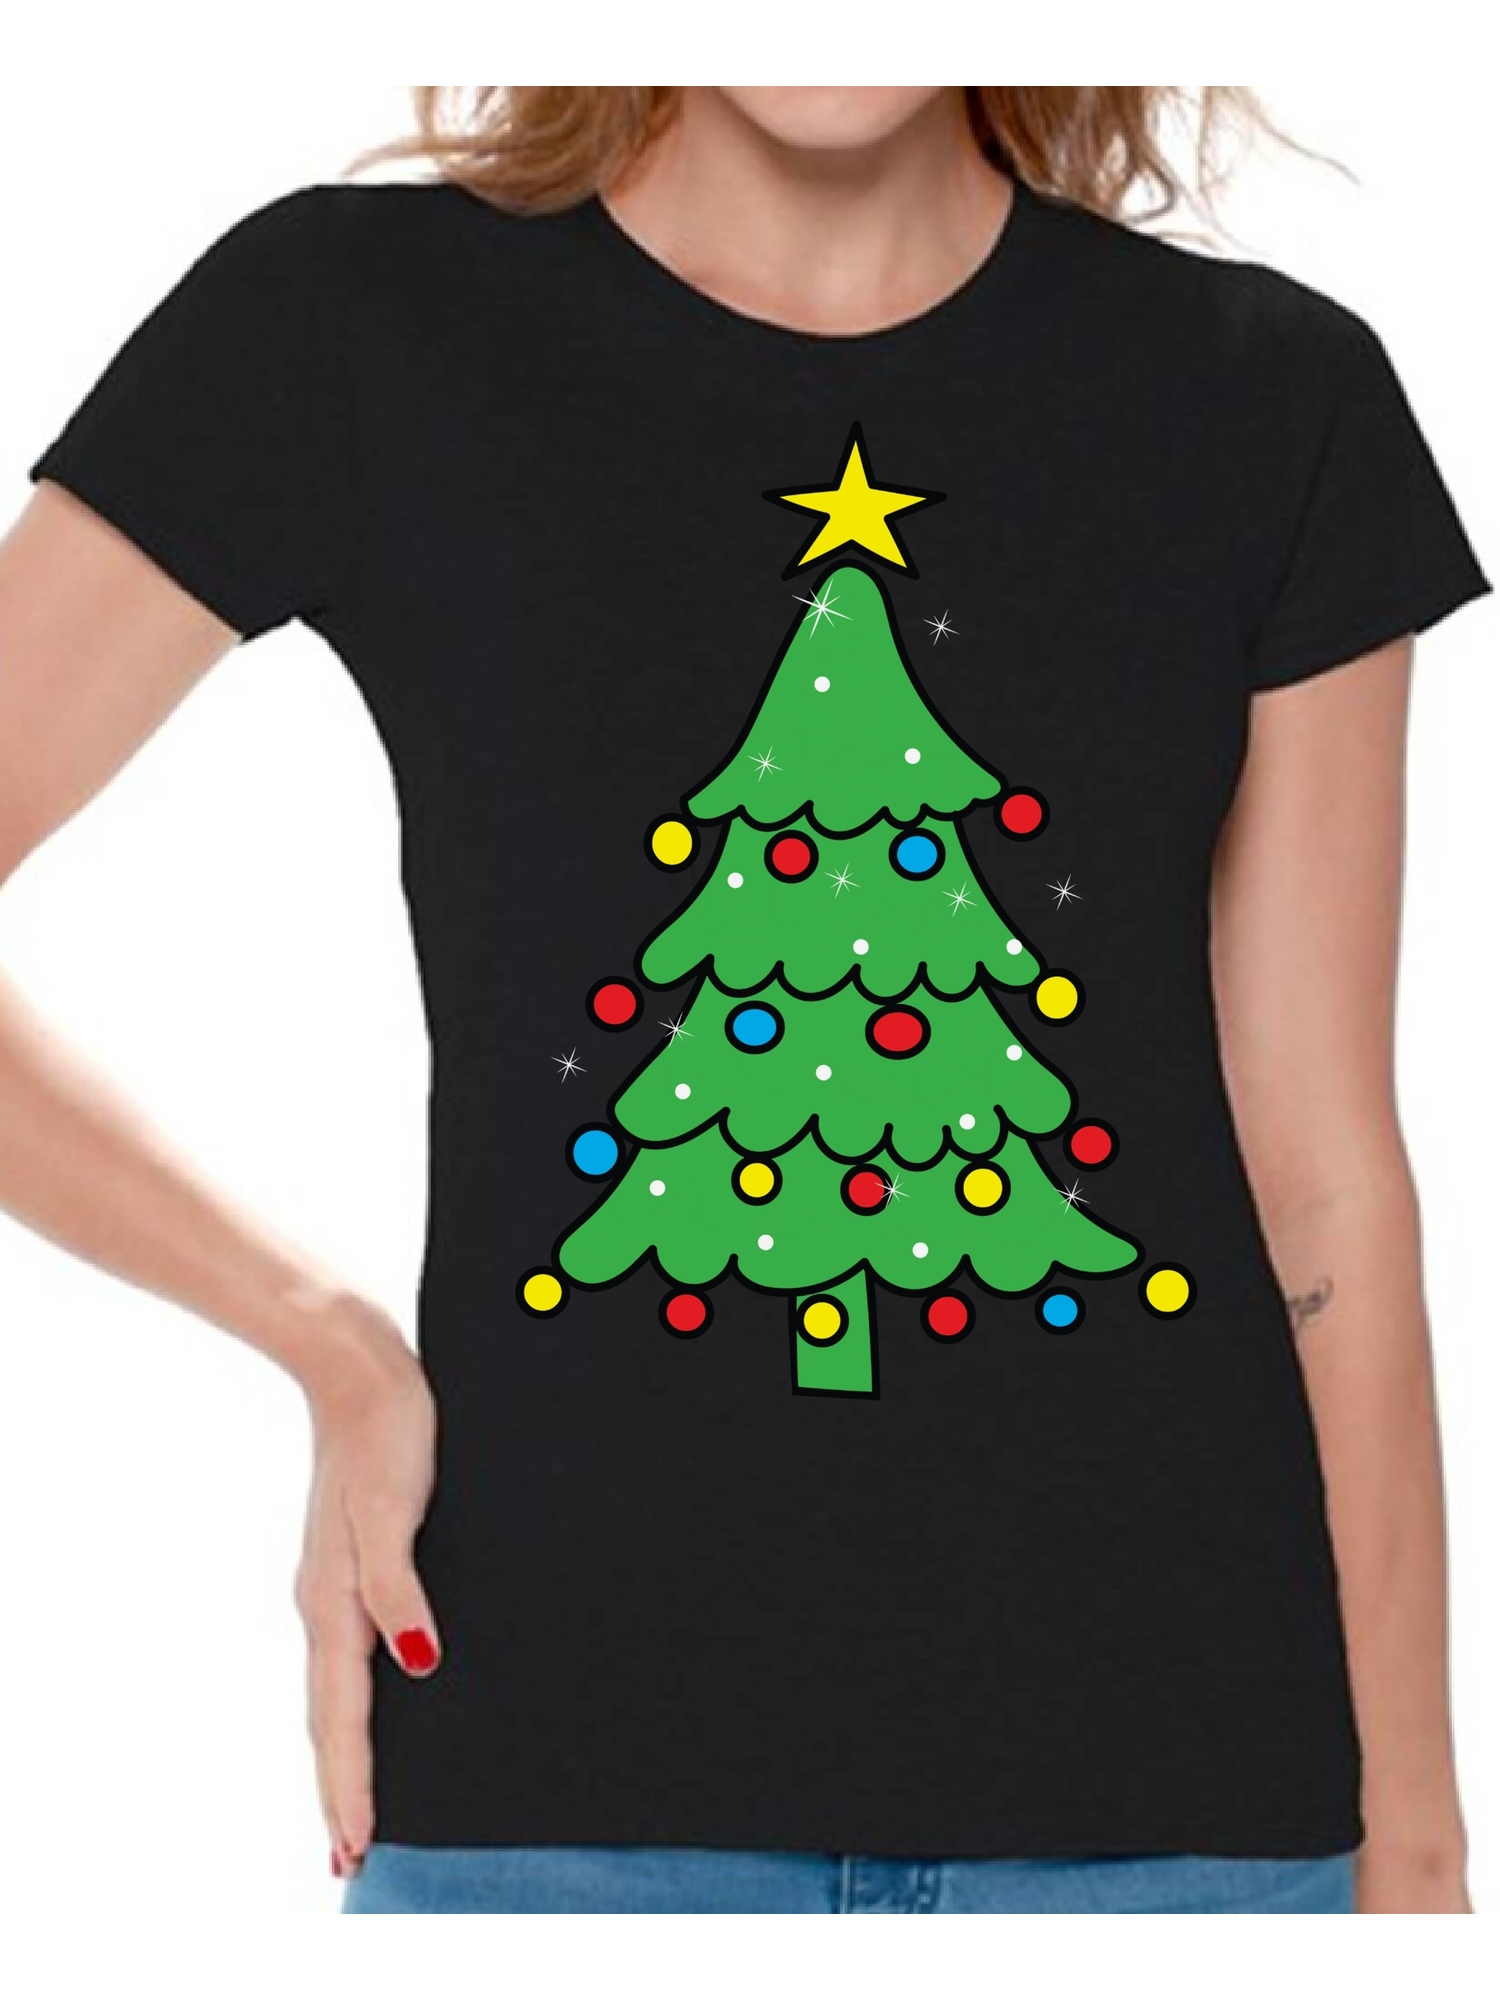 Christmas Tree Cat Summer Basic Kids Short Sleeve Tee Short T Shirts